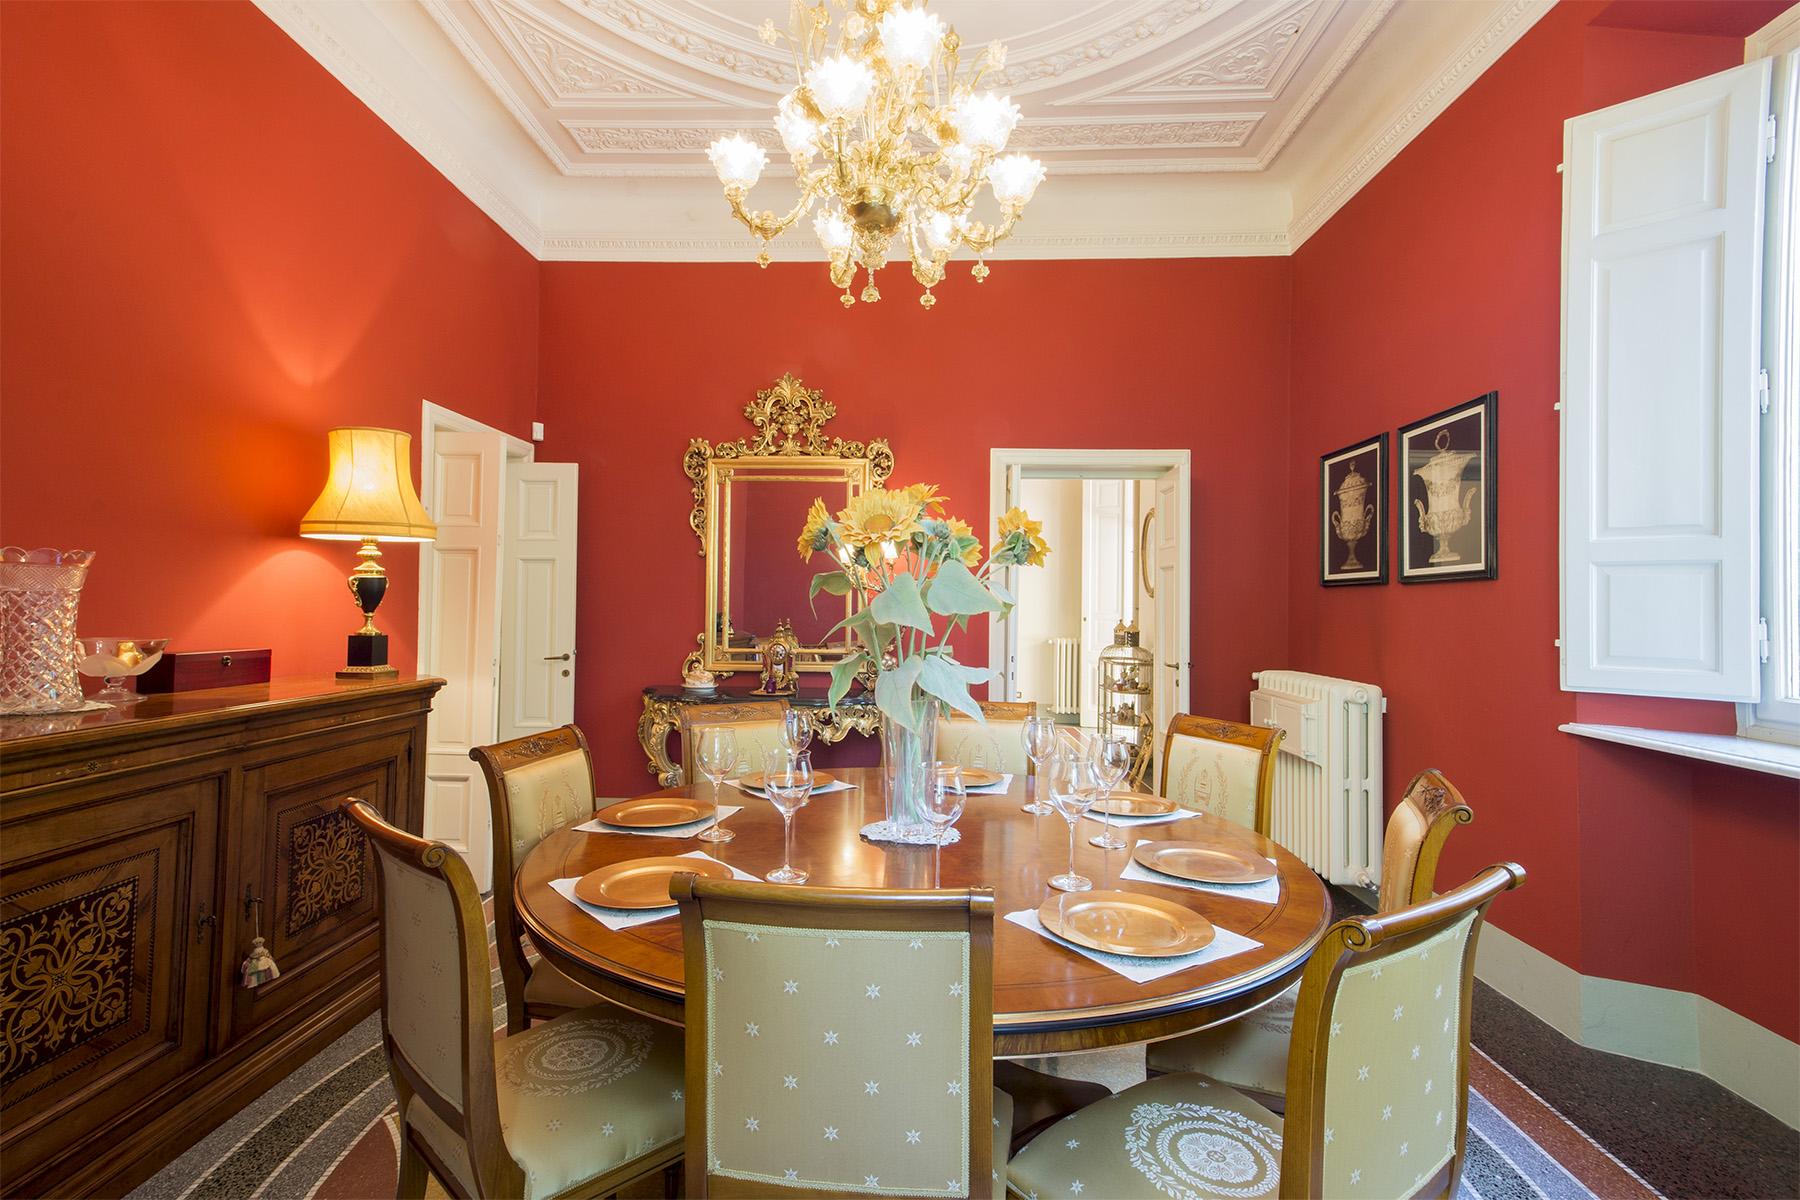 Villa in Vendita a Lucca: 5 locali, 760 mq - Foto 7